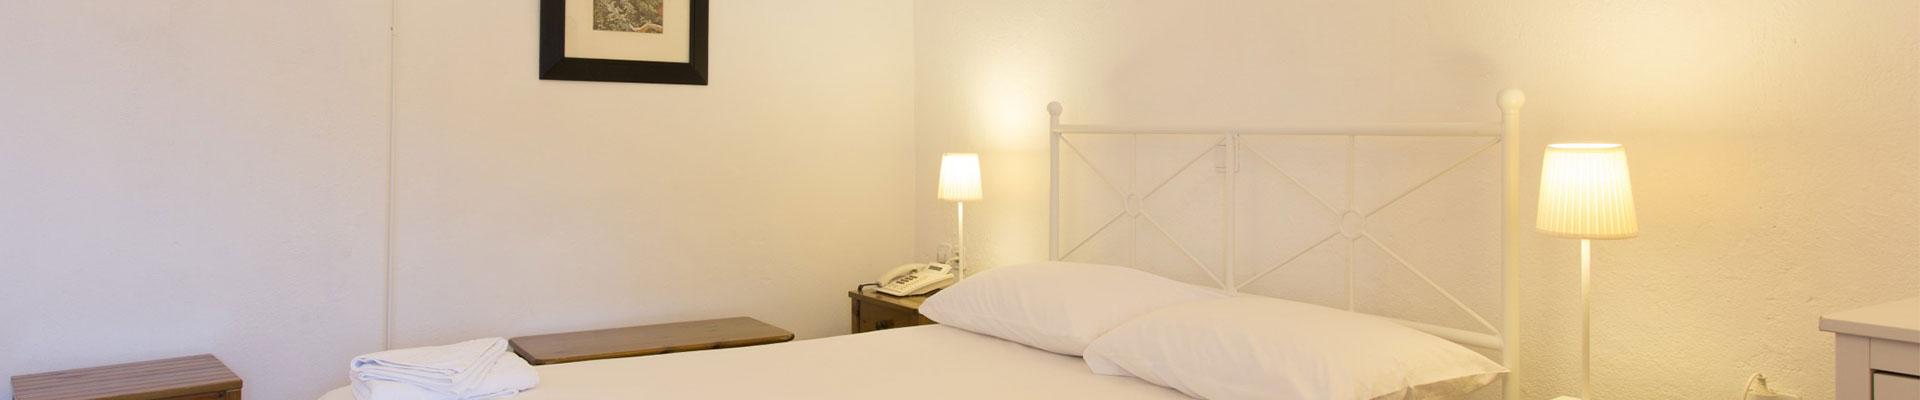 Hotel Castro in Folegandros